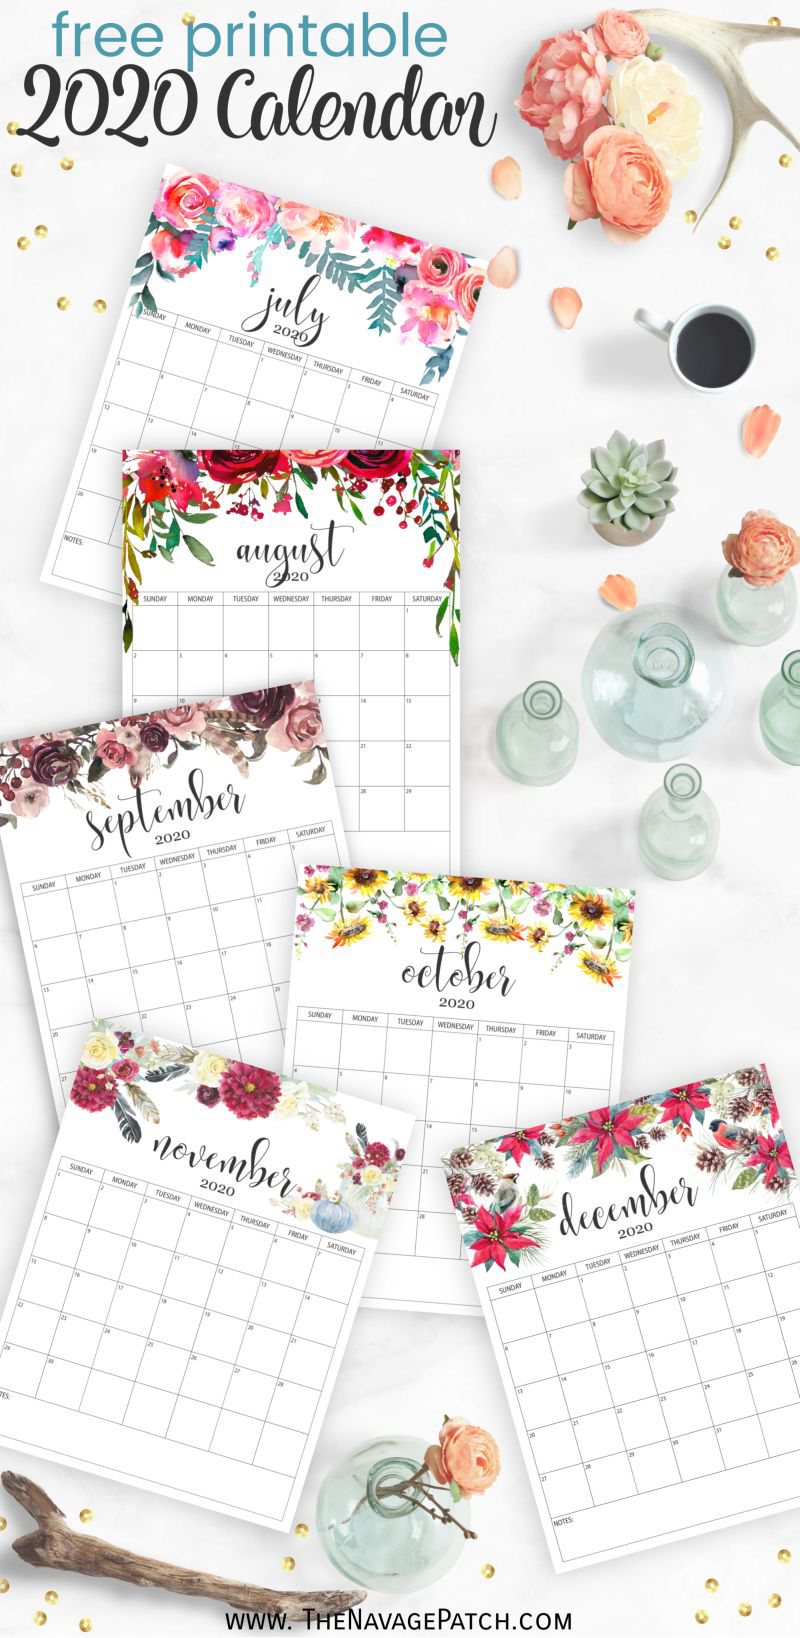 Free Printable Calendar 2020 - The Navage Patch